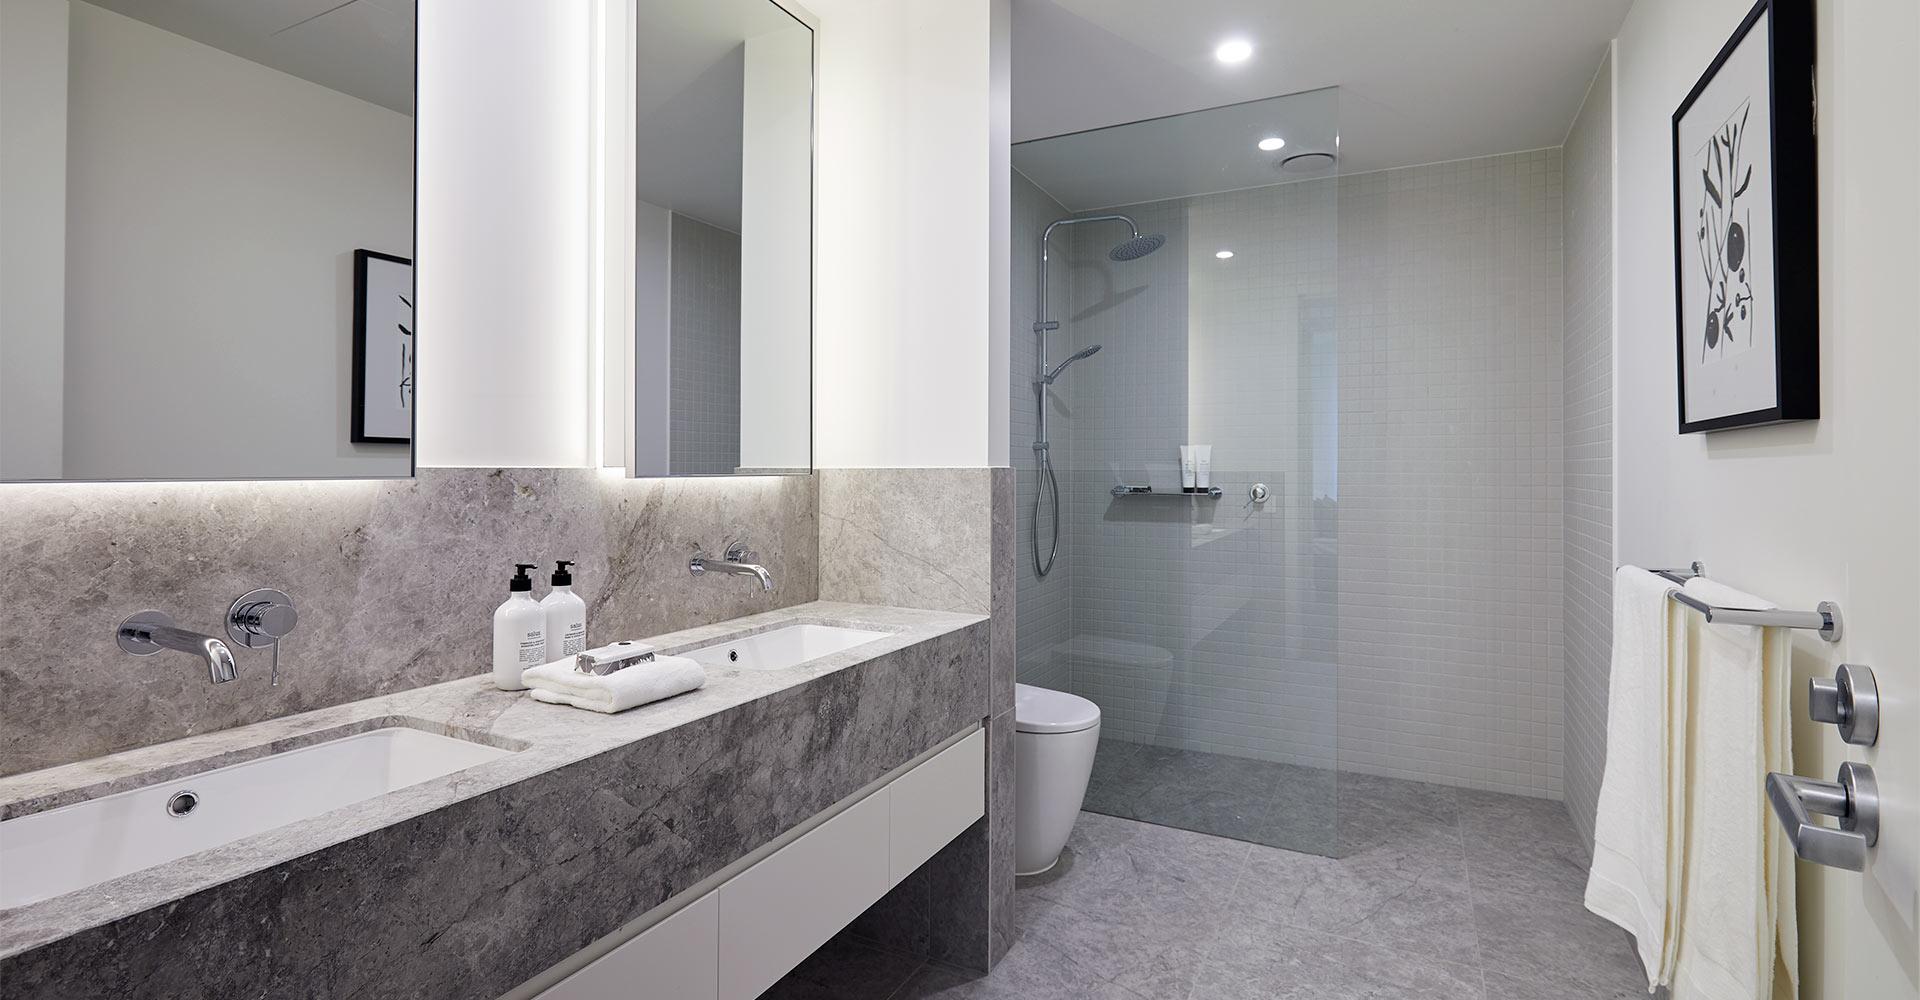 Retirement apartment bathroom with premium finishes at Pavilions Blackburn Lake